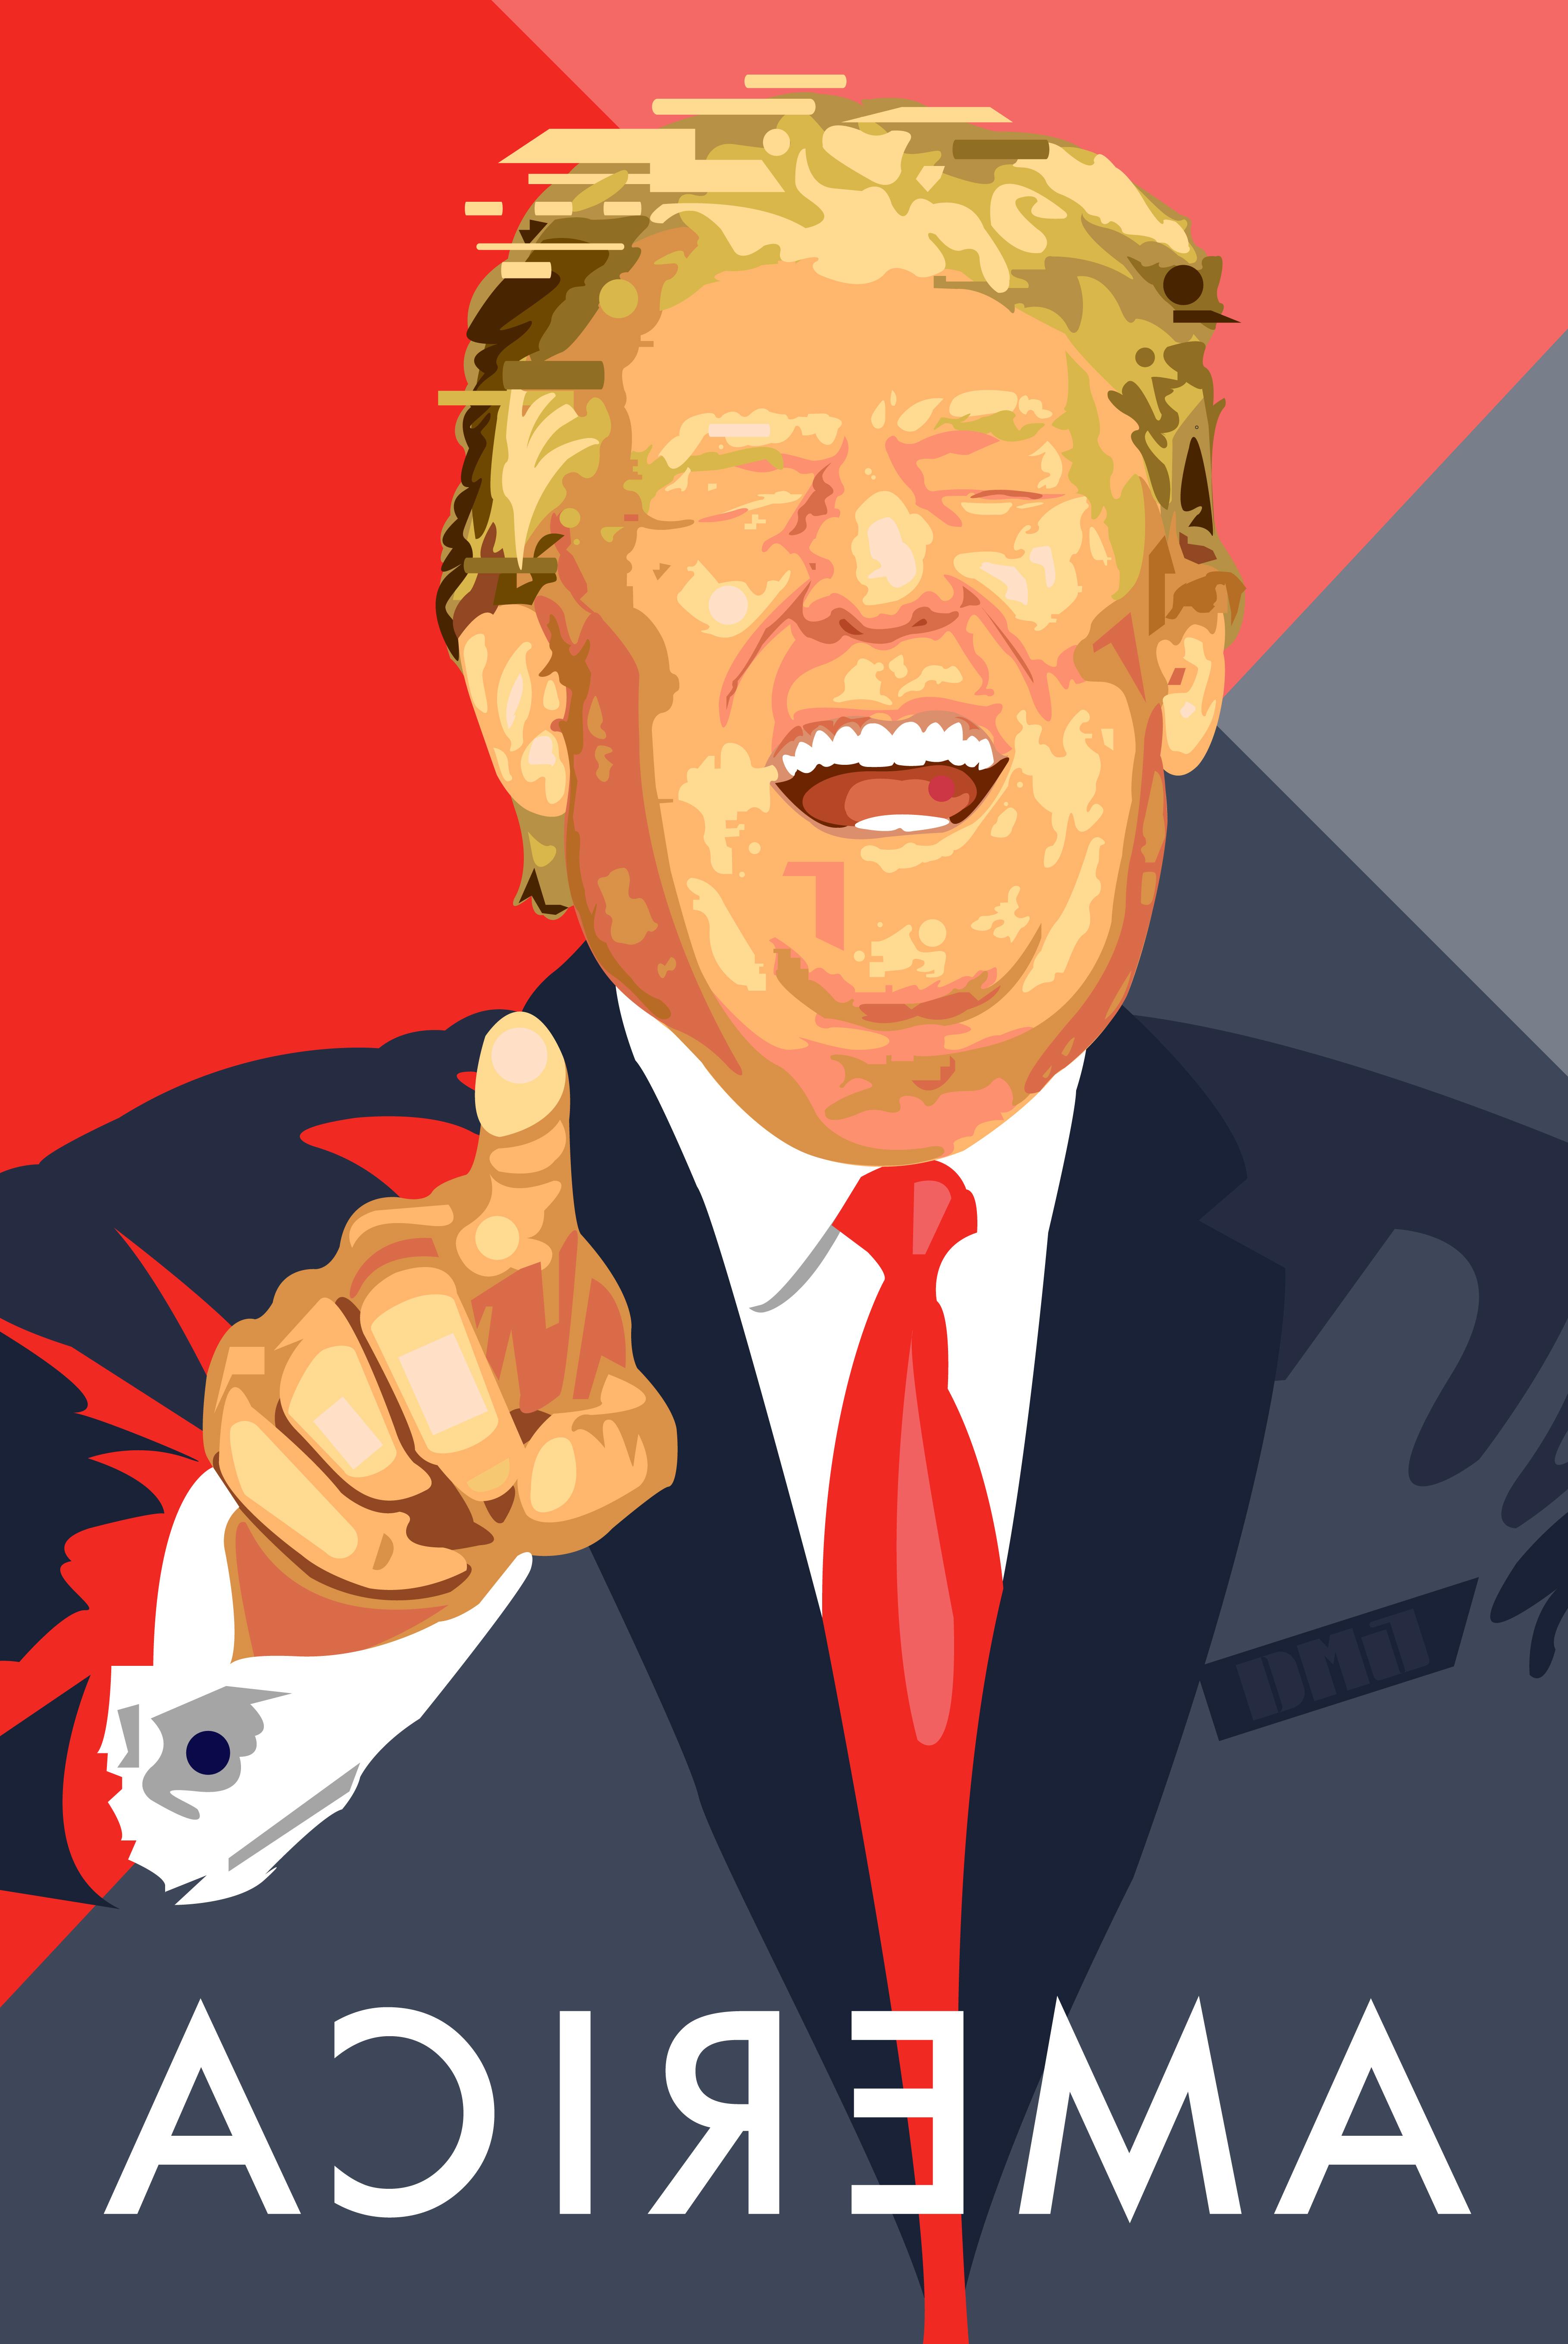 Trump Poster 2016